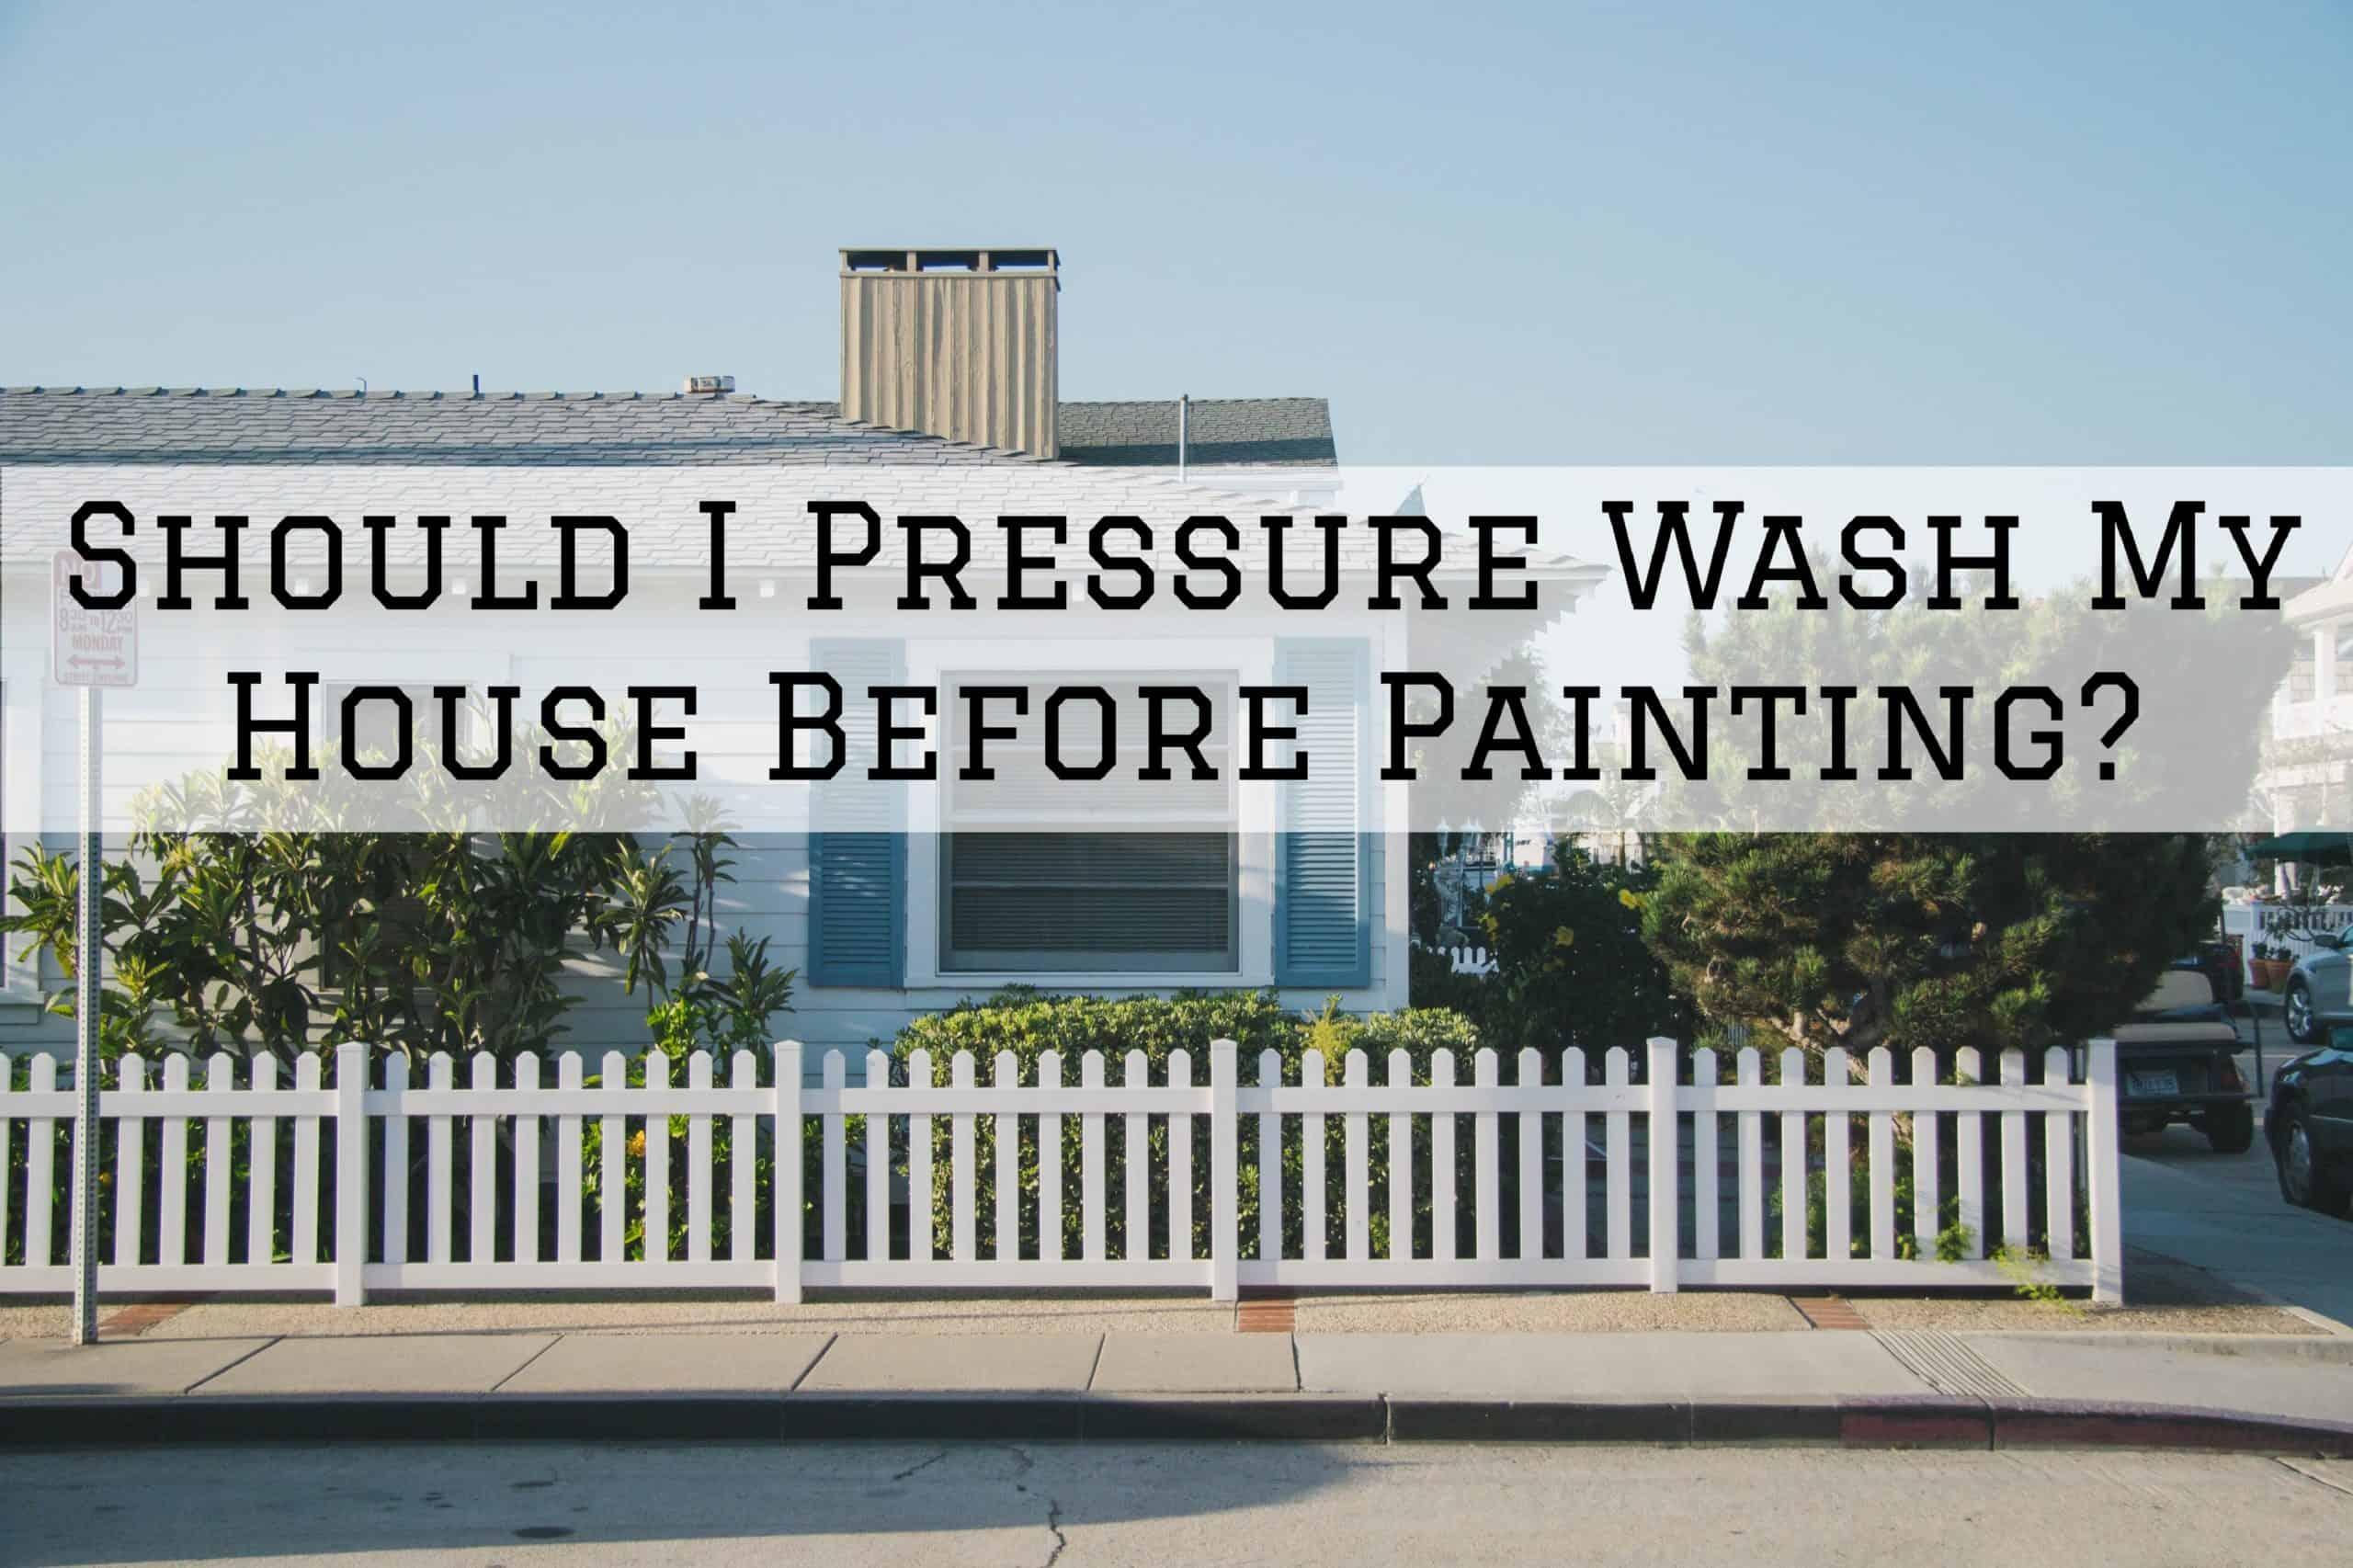 2020-03-24 Brush and Roll Painting Omaha NE Pressure Wash House